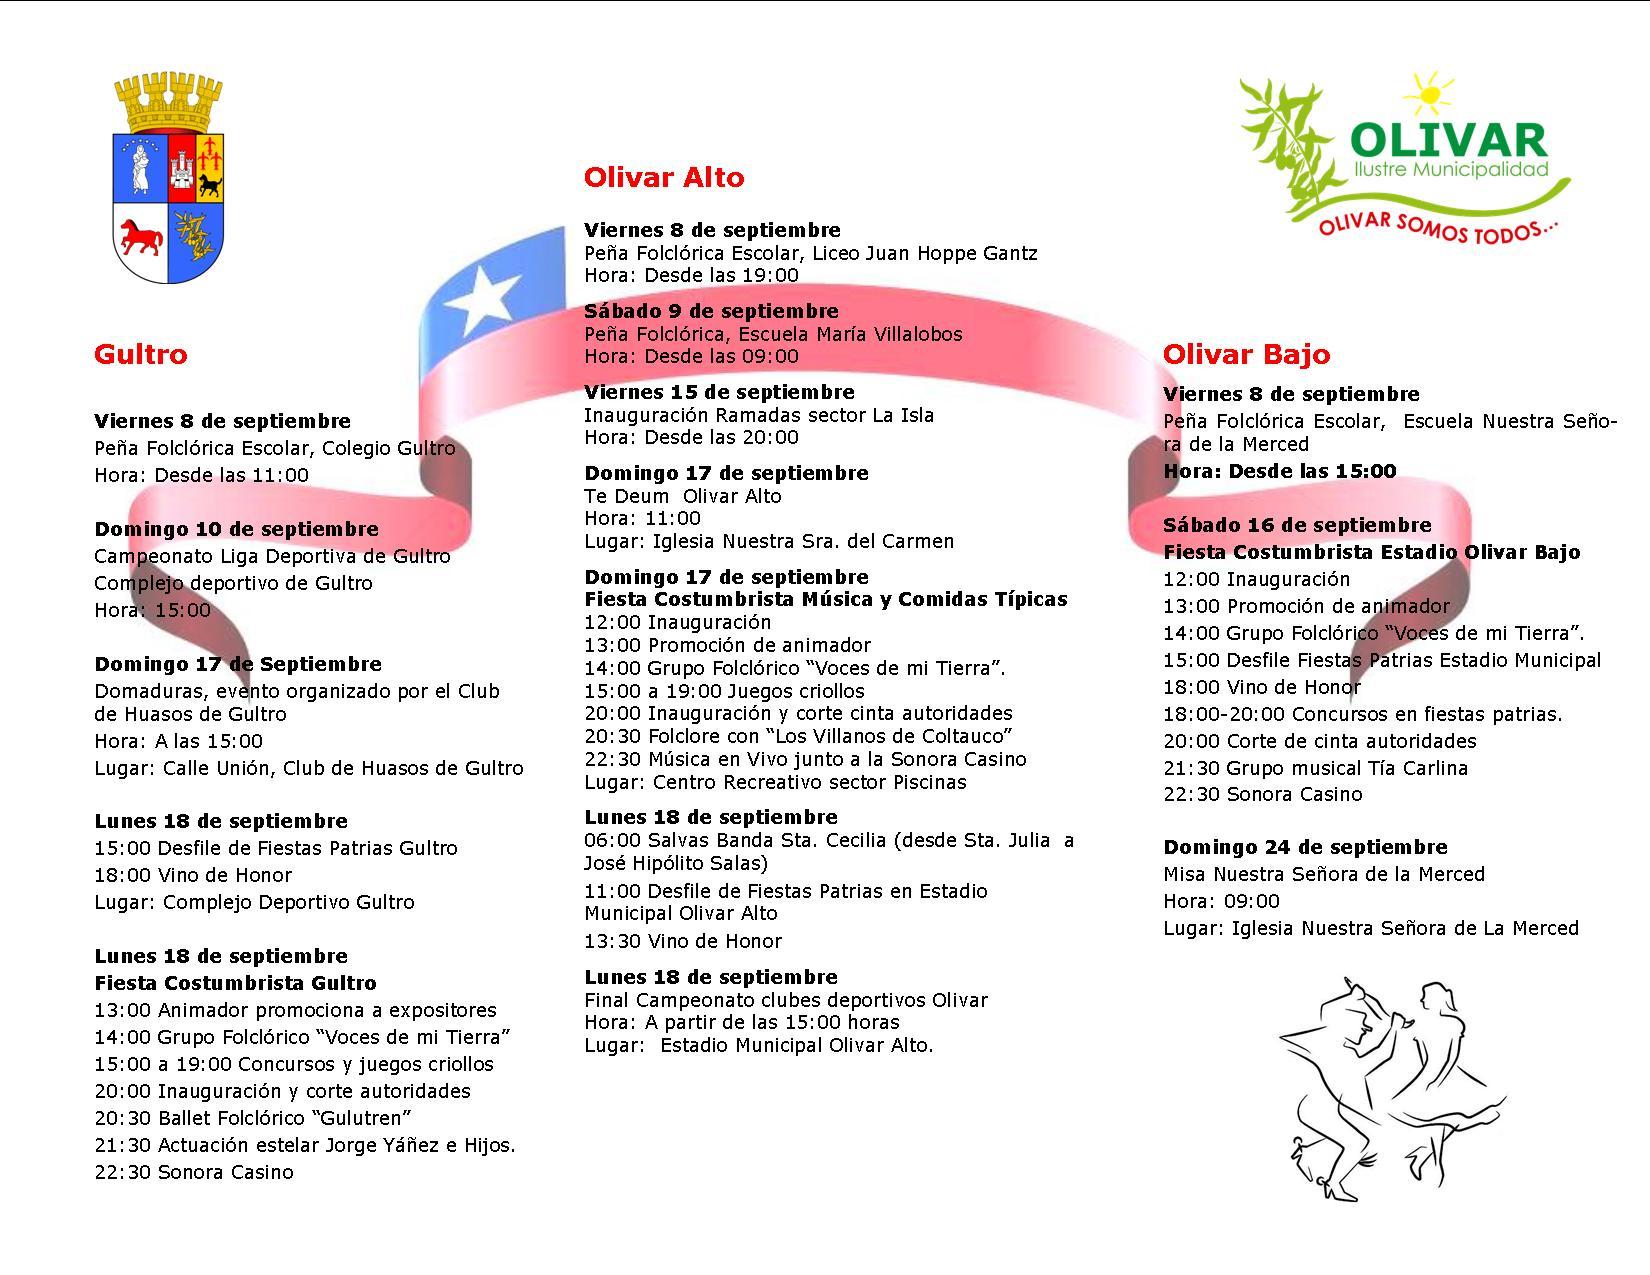 Programa Oficial de Fiestas Patrias Olivar 2017